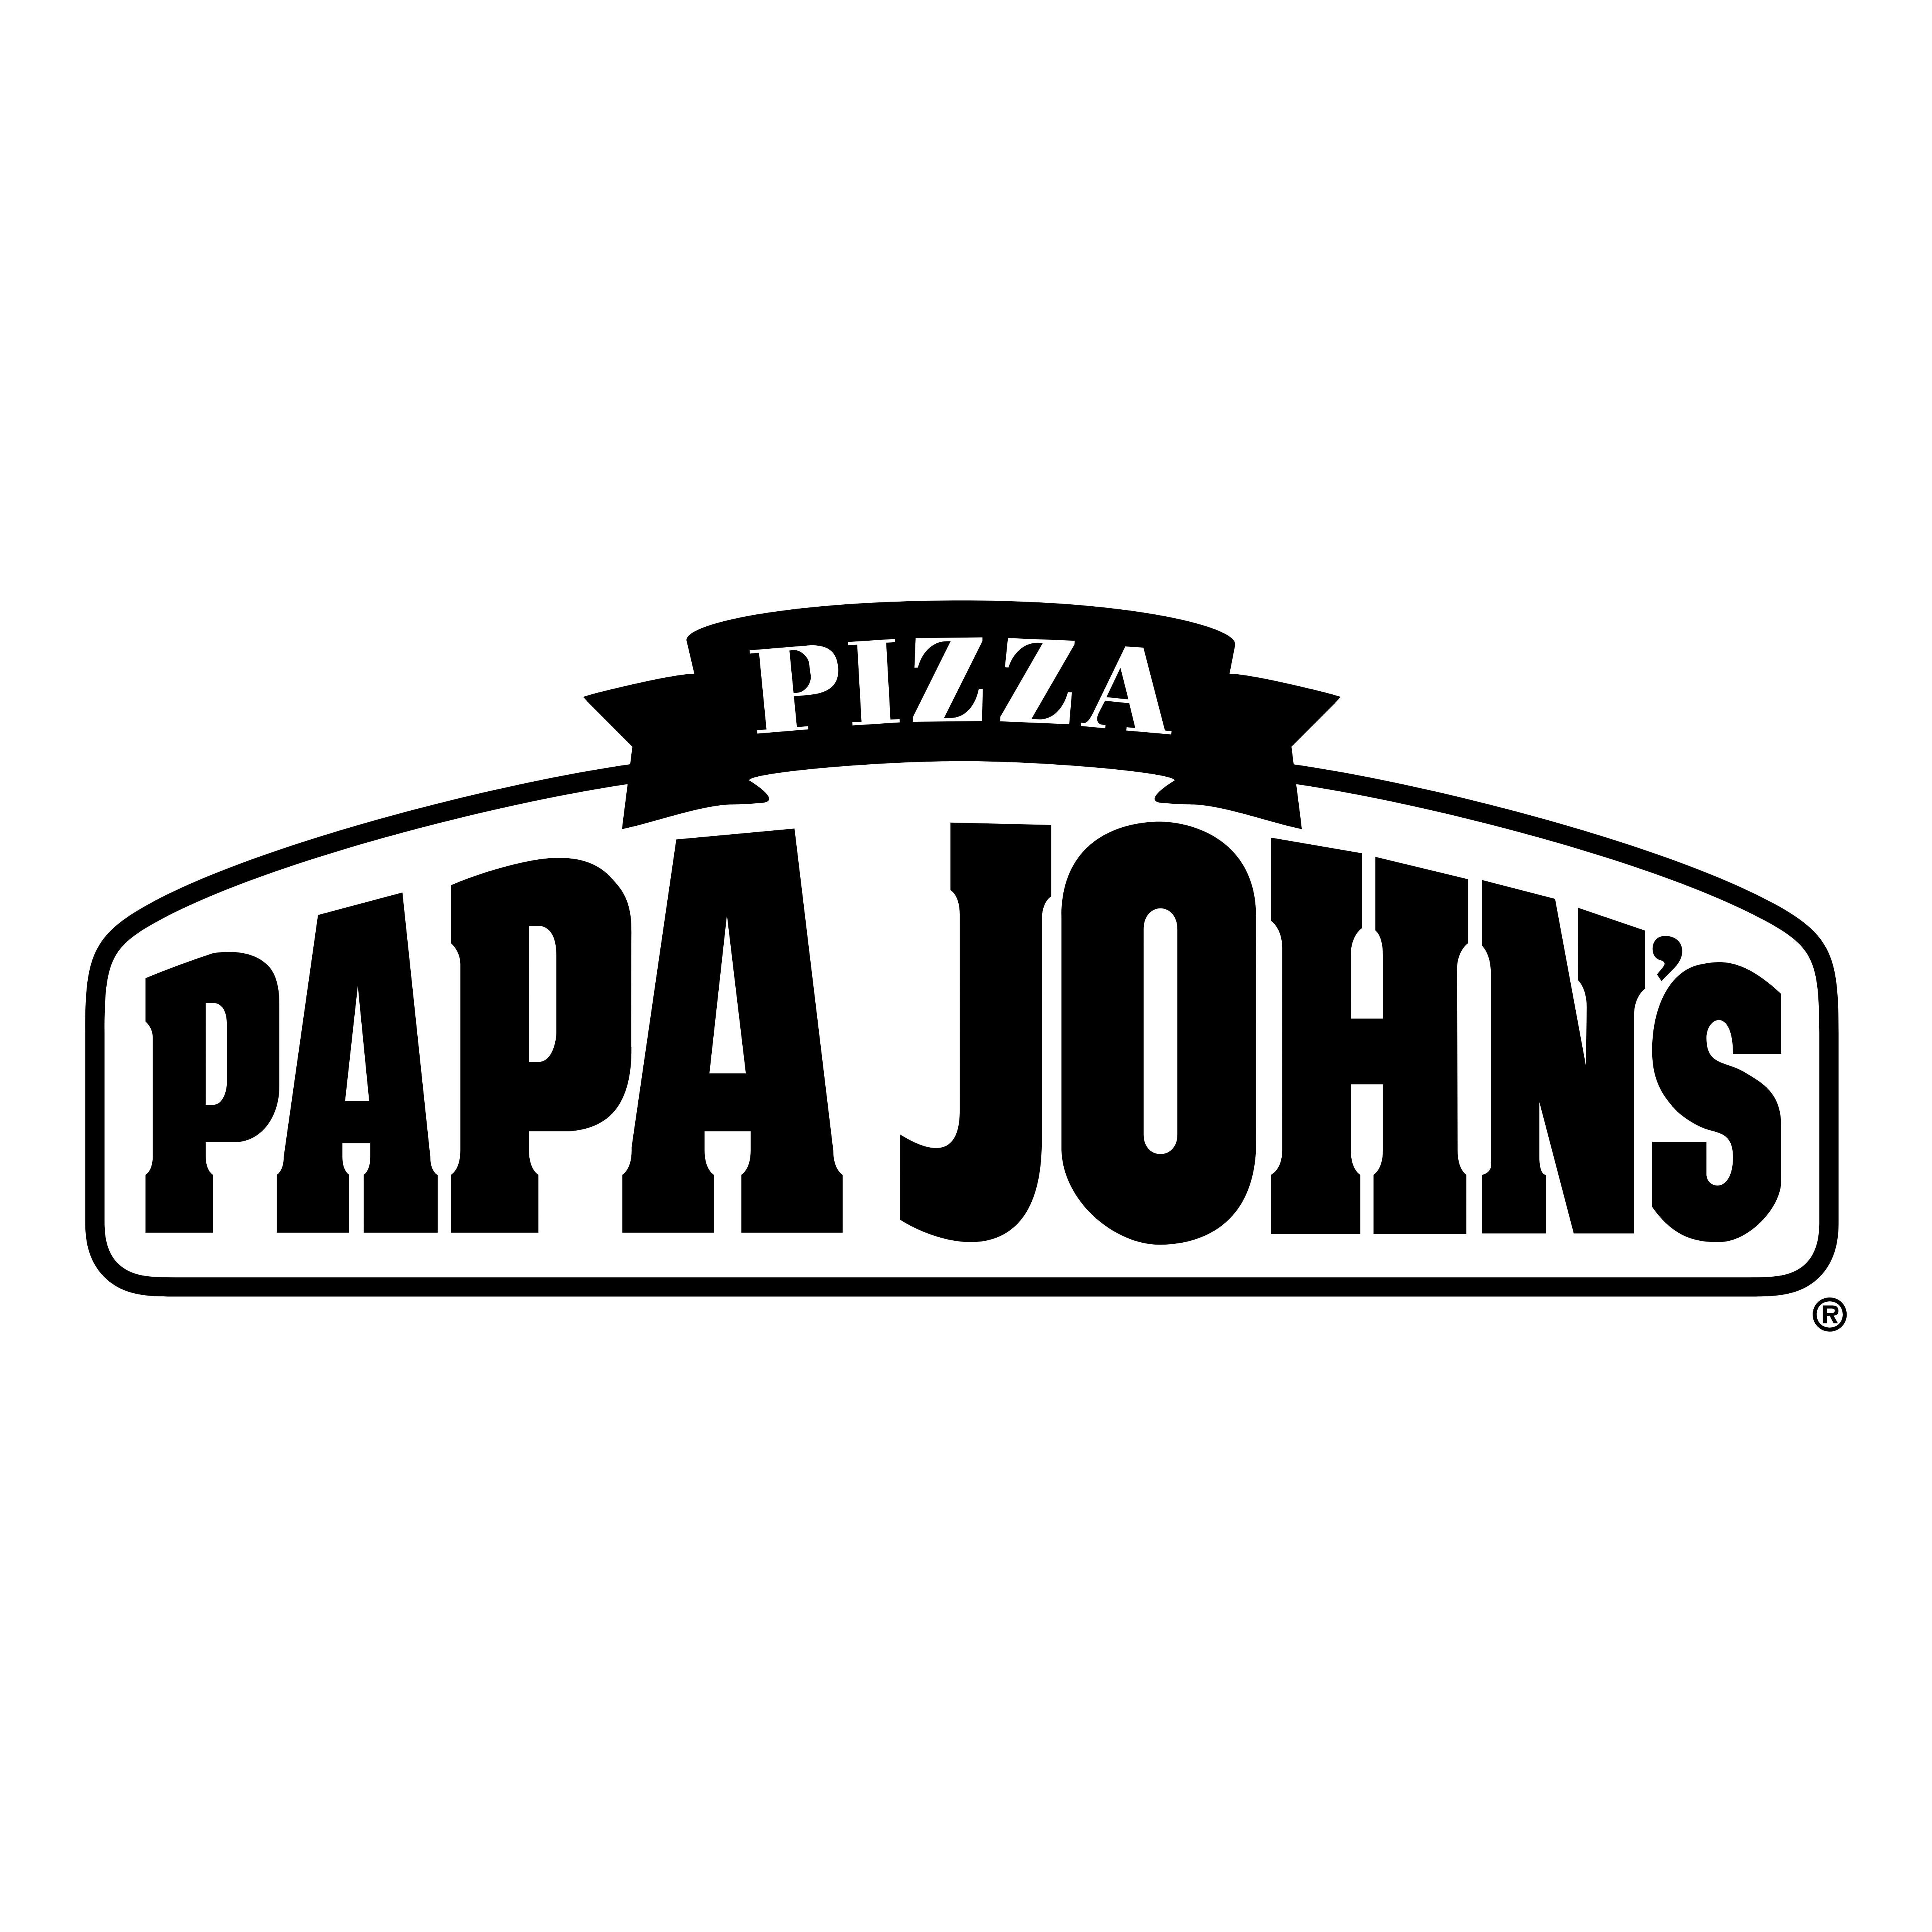 papa johns free pizza  »  8 Photo »  Awesome ..!